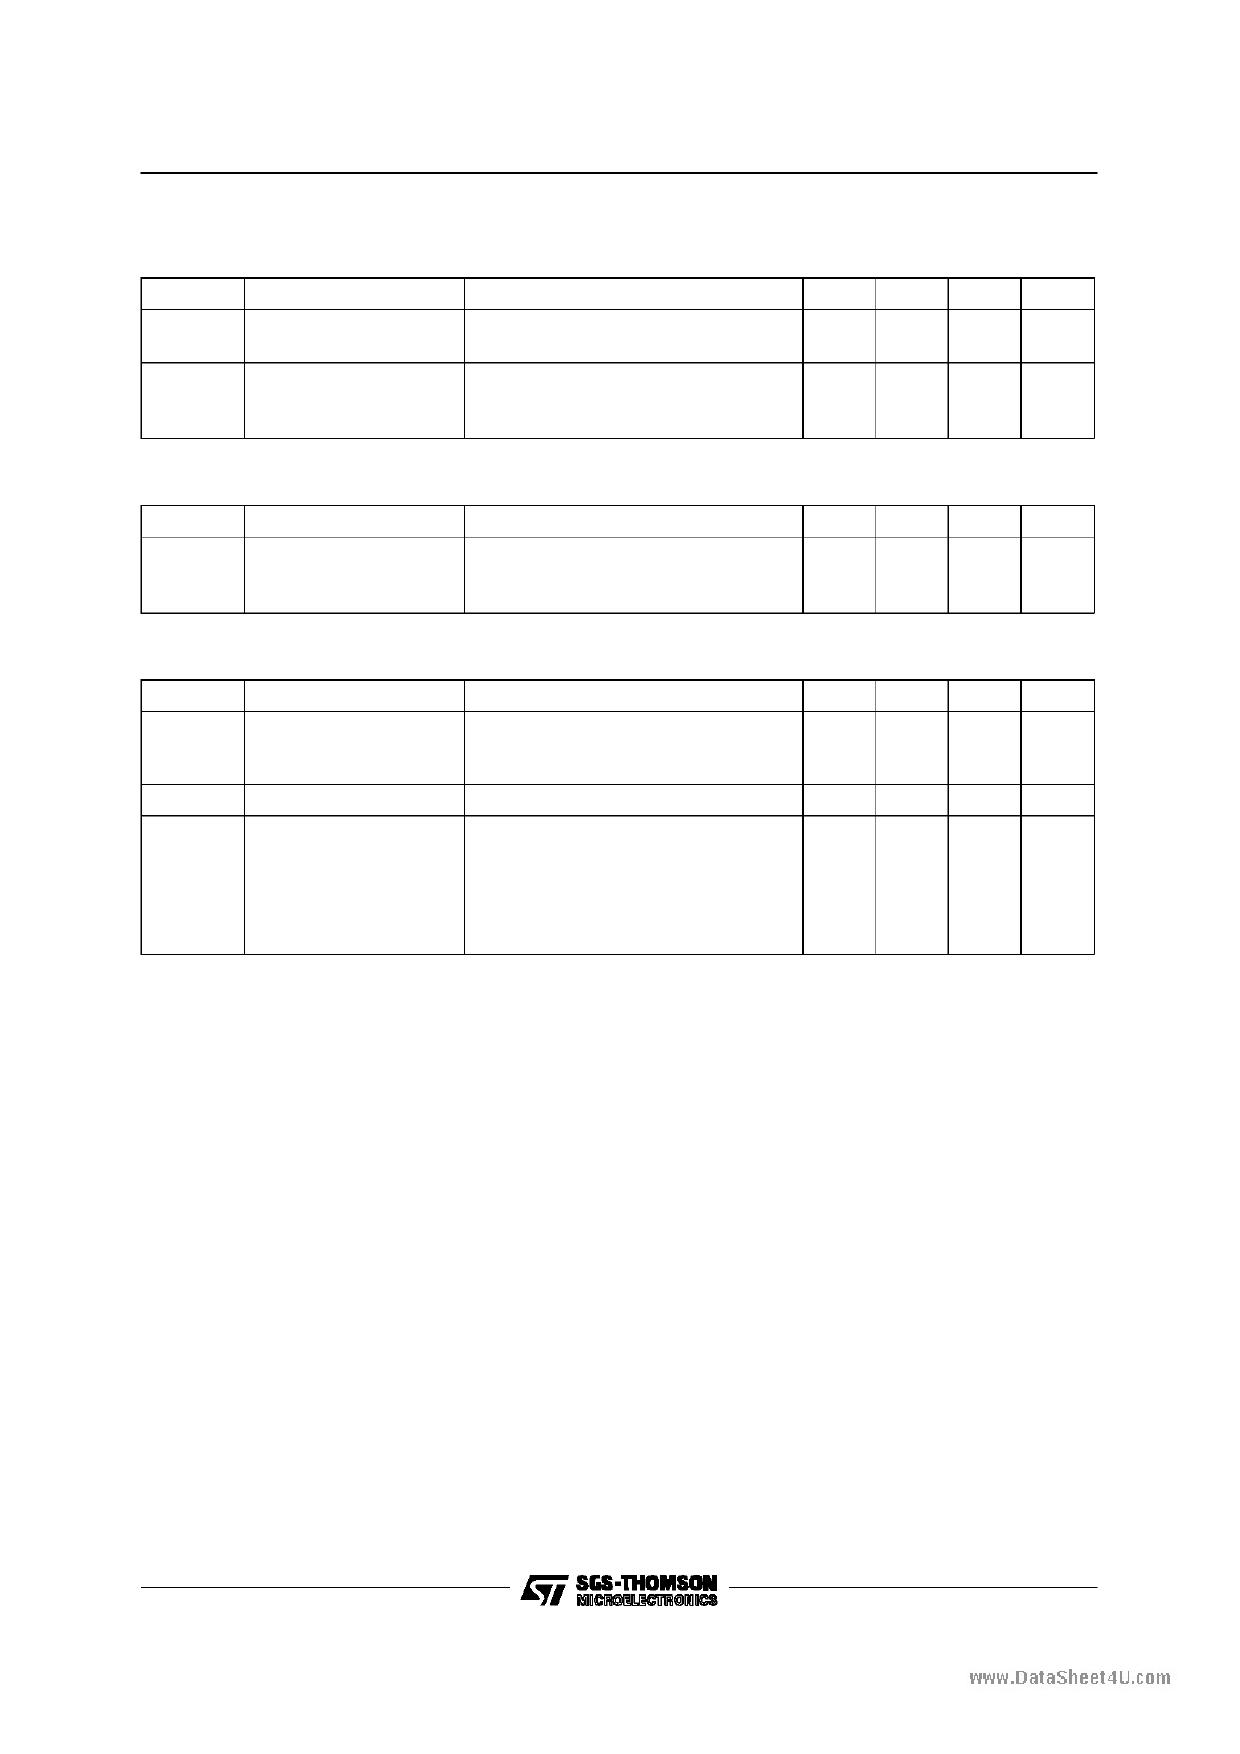 P6NA60FP pdf, 電子部品, 半導体, ピン配列